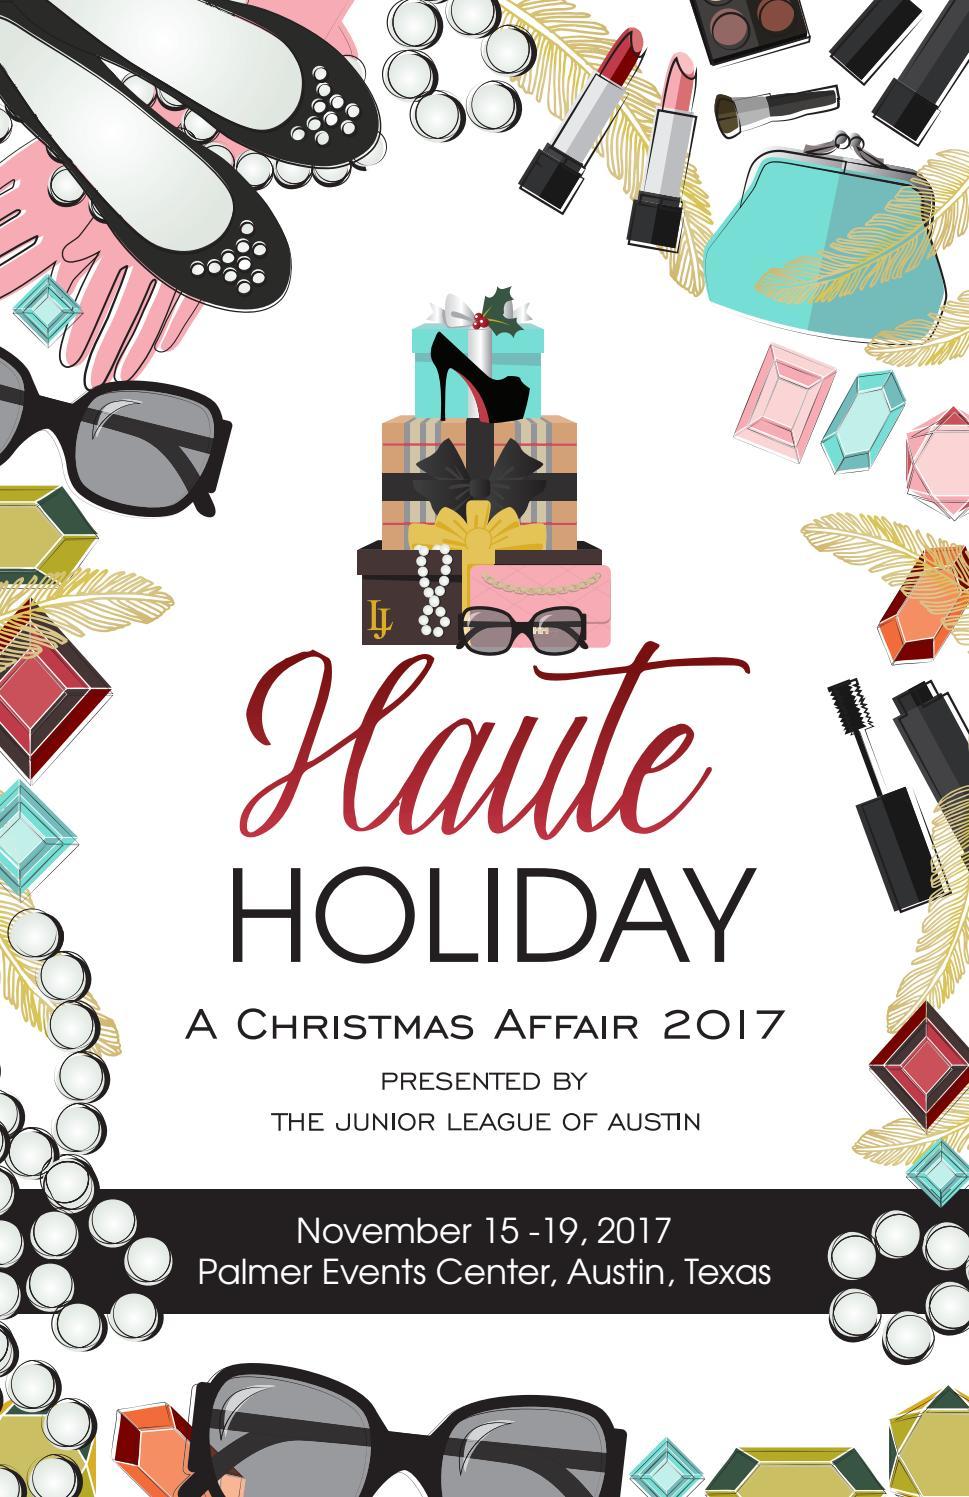 Capitol Chevrolet Austin >> 2017 A Christmas Affair Invitation by The Junior League of ...